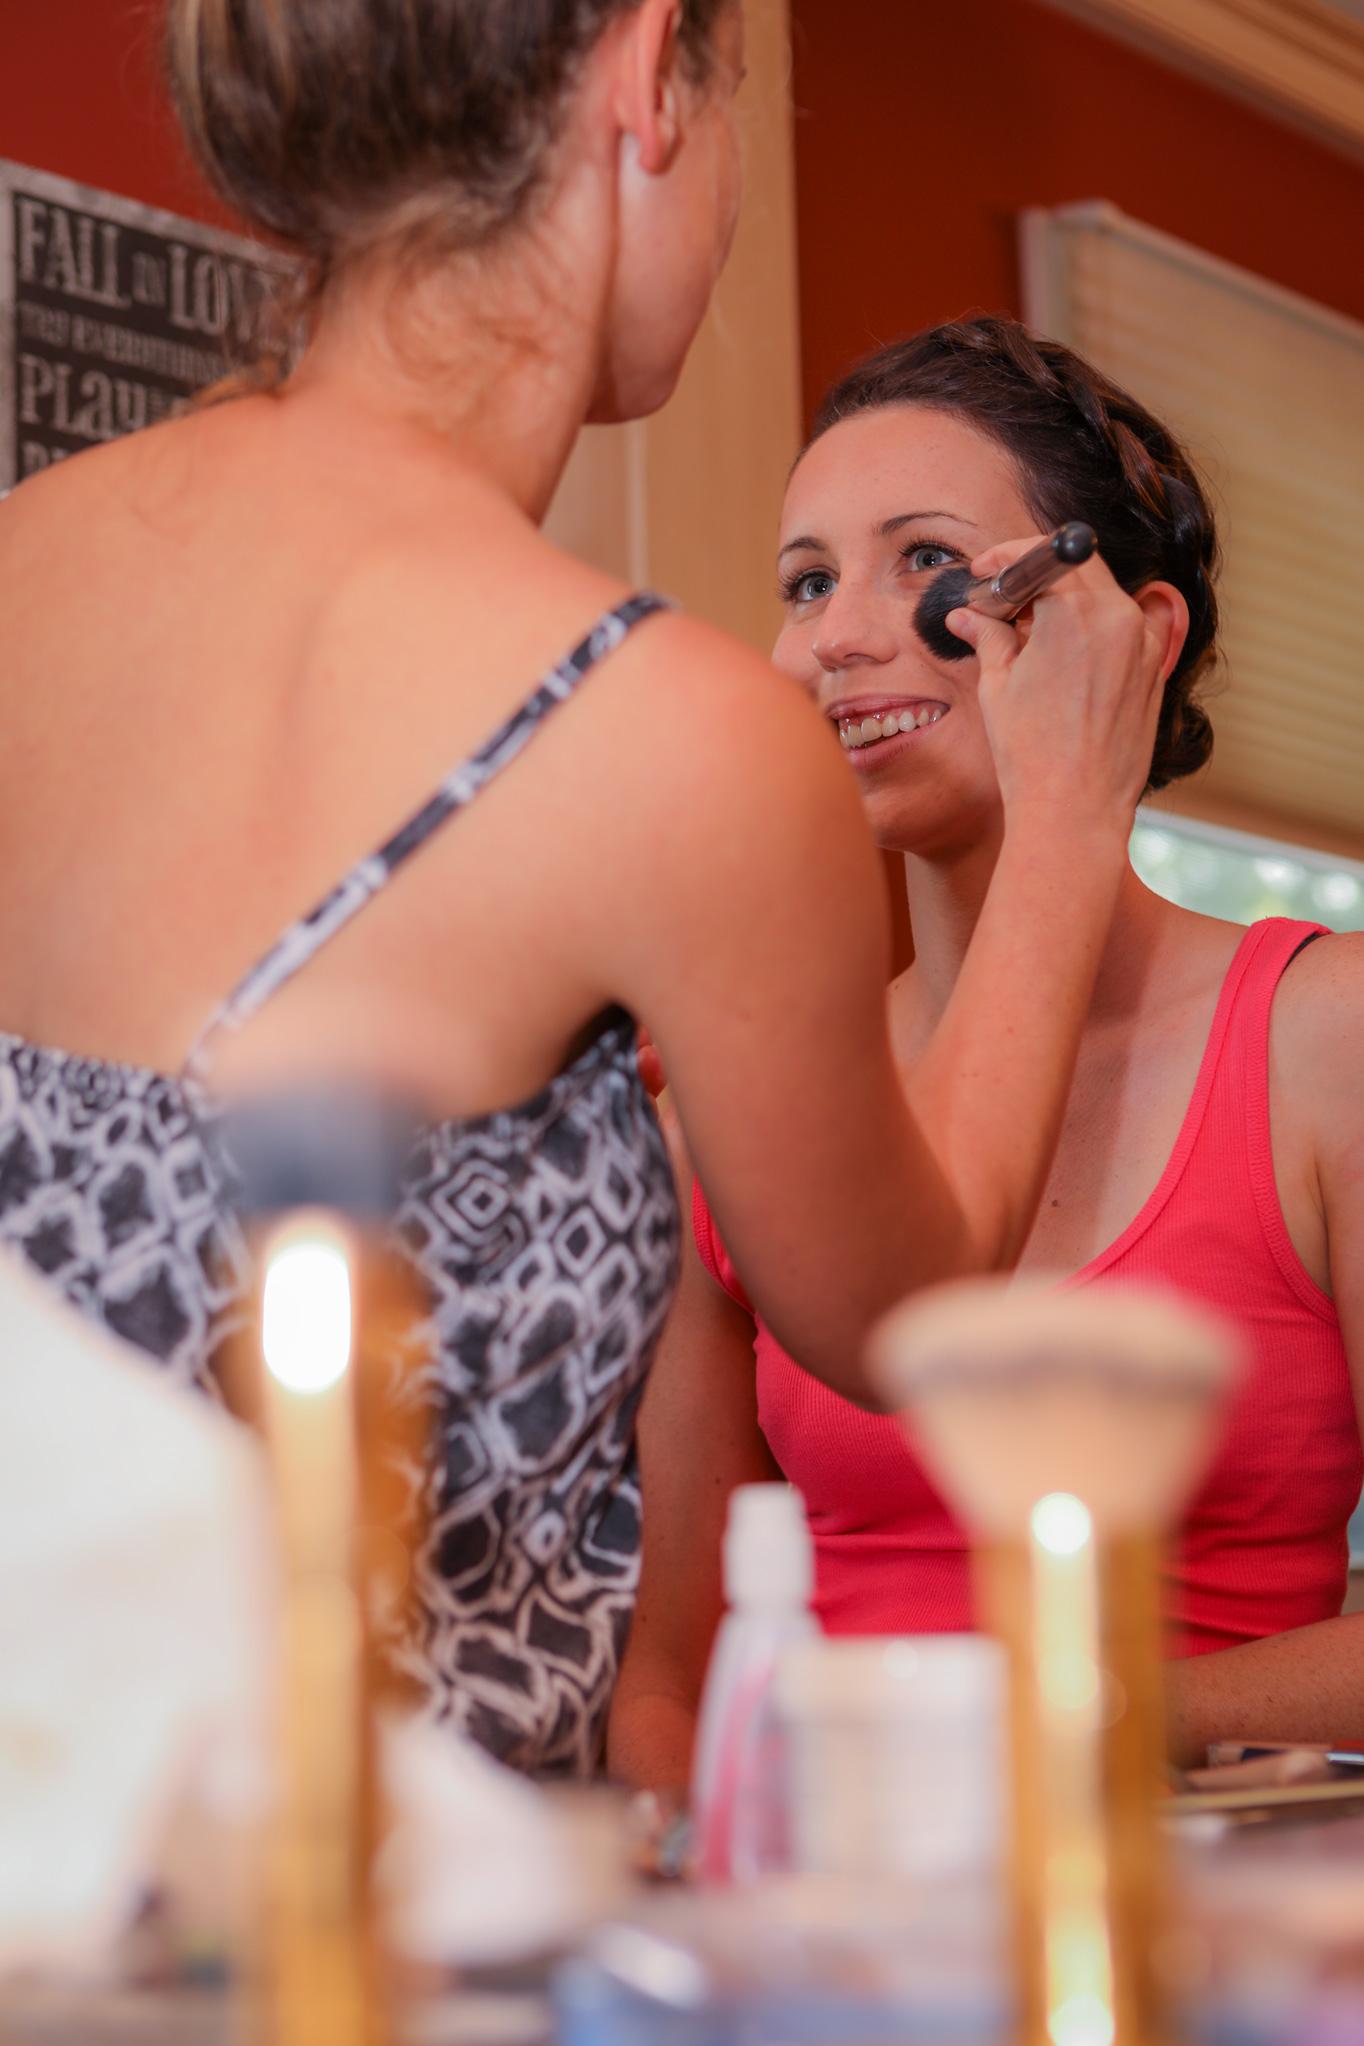 annie_matthew_wedding_cary_illinois_jeff_gathman_photography_3.jpg